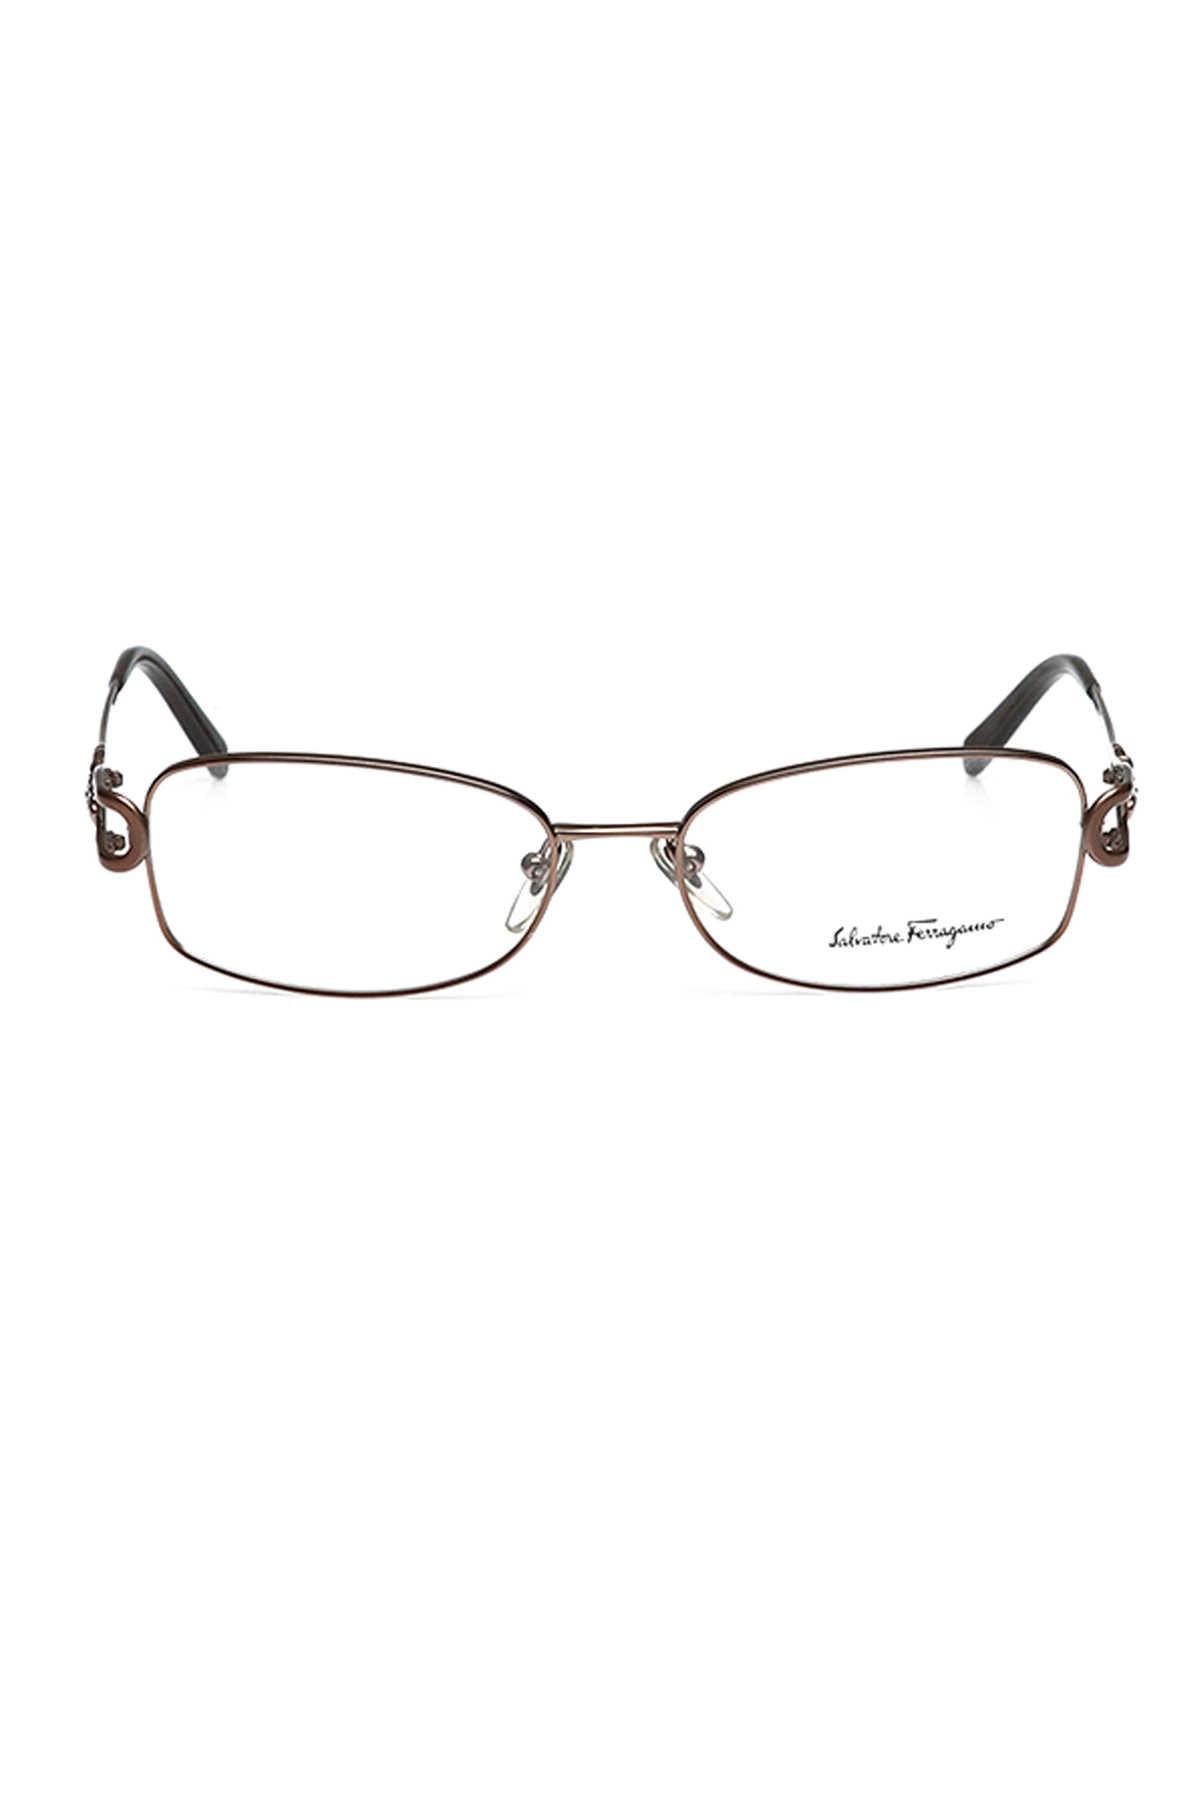 Markamilla Vrouwen Leesbril Frame Demo Bril Eyewear Transparante Hoge Kwaliteit Womensalvatore Ferragamo Sf 1808B 656 52